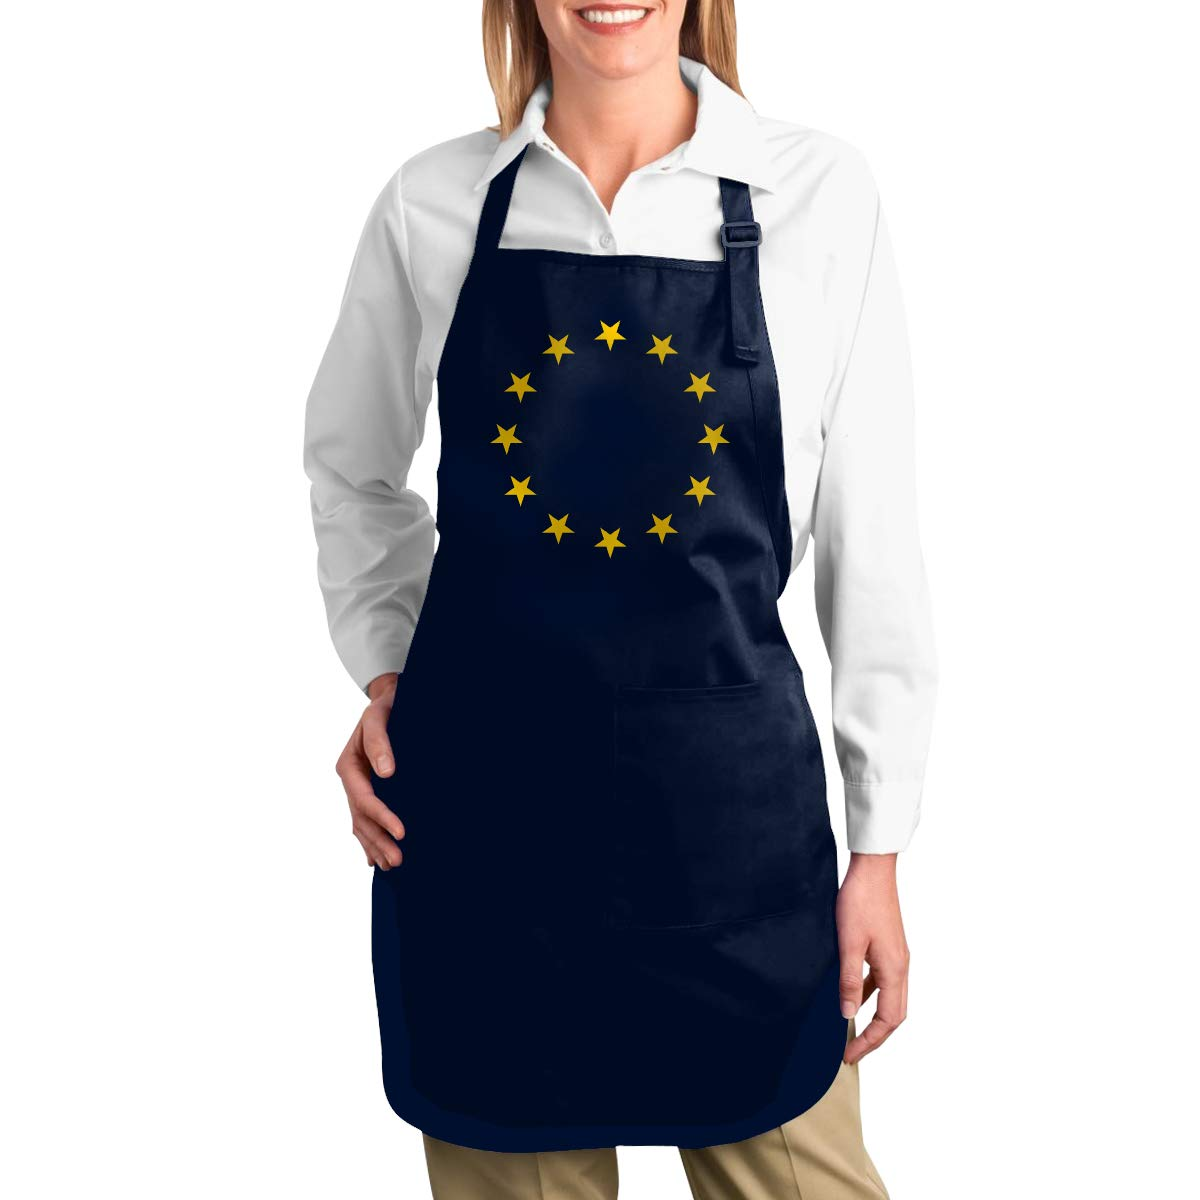 ANZIKEJI European Union EU Flag Euro EU Stars Brexit Remain Heavy Duty Canvas Work Apron,Tool Pockets Back Straps Adjustable